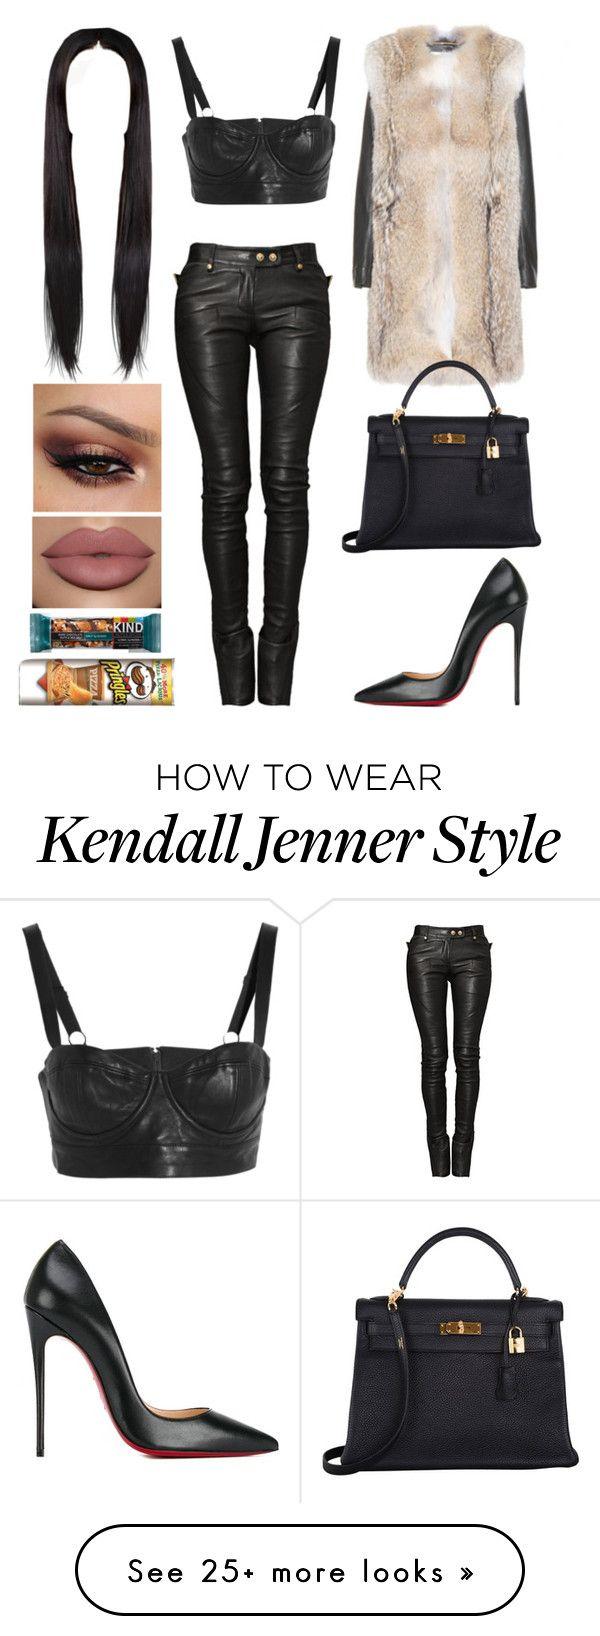 656 Best Kendall Jenner Style Images On Pinterest